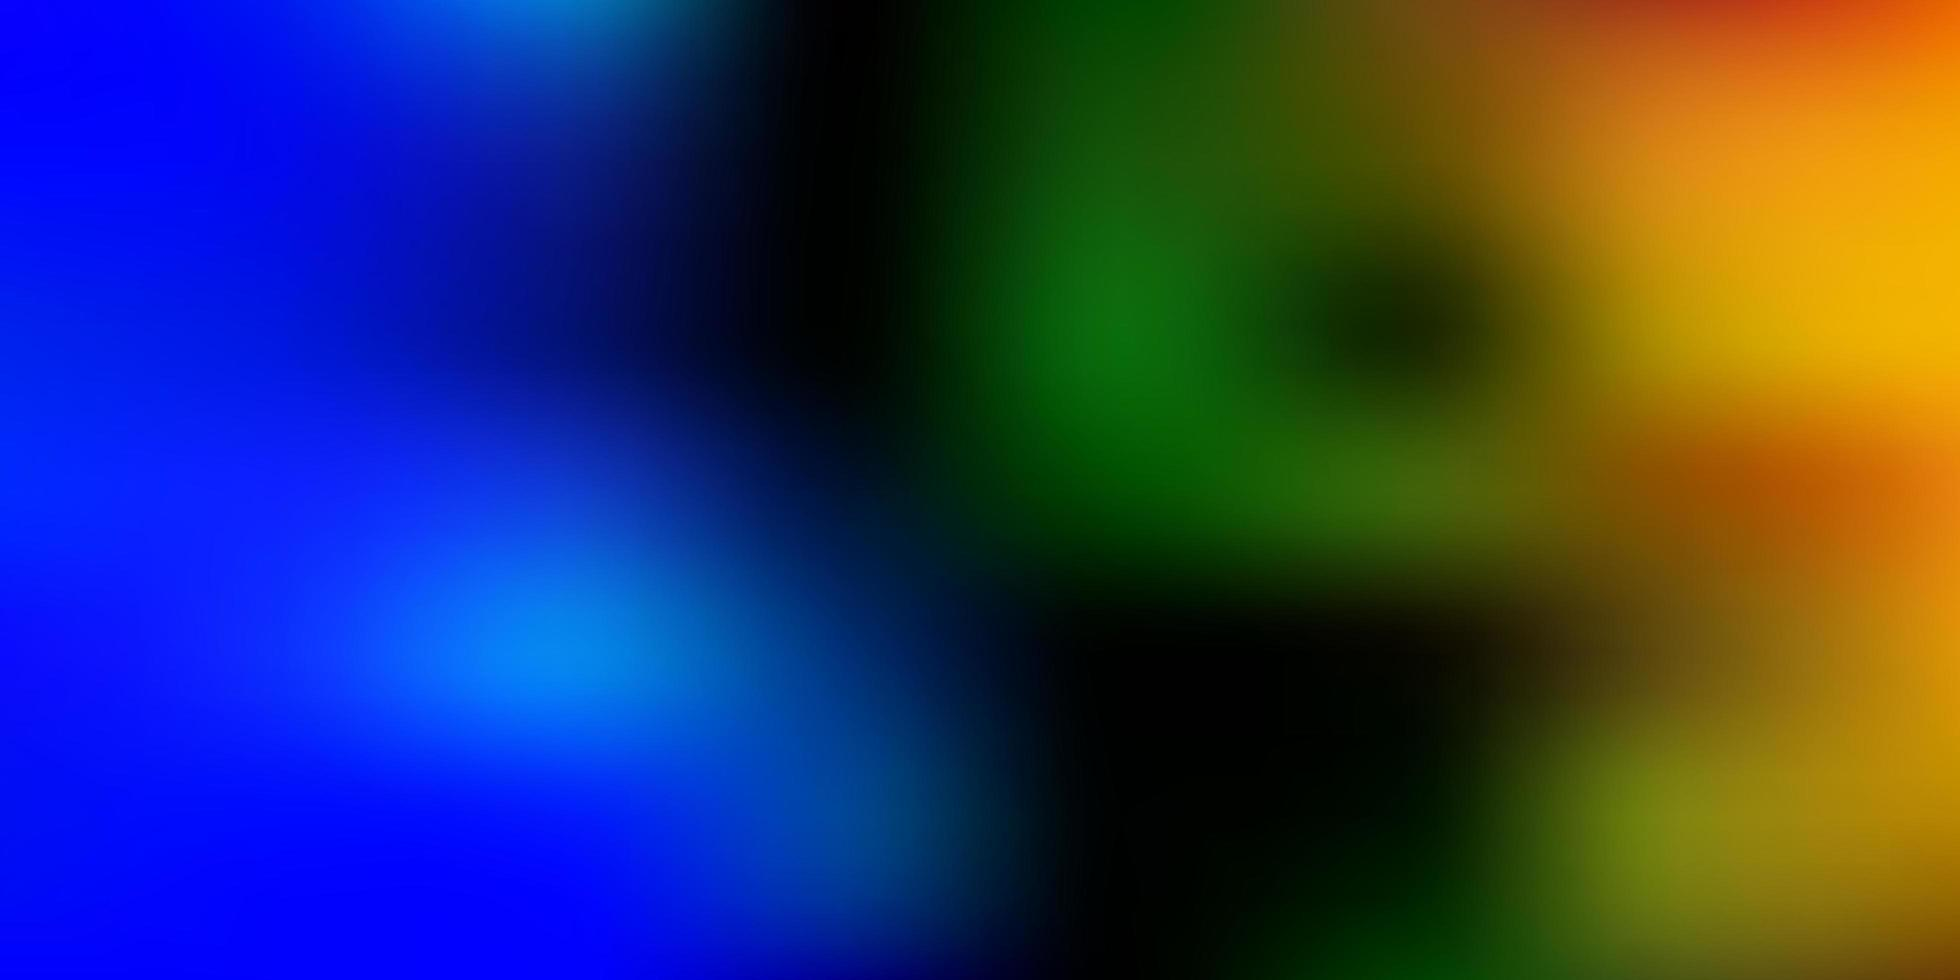 layout di sfocatura gradiente vettoriale blu chiaro, verde.